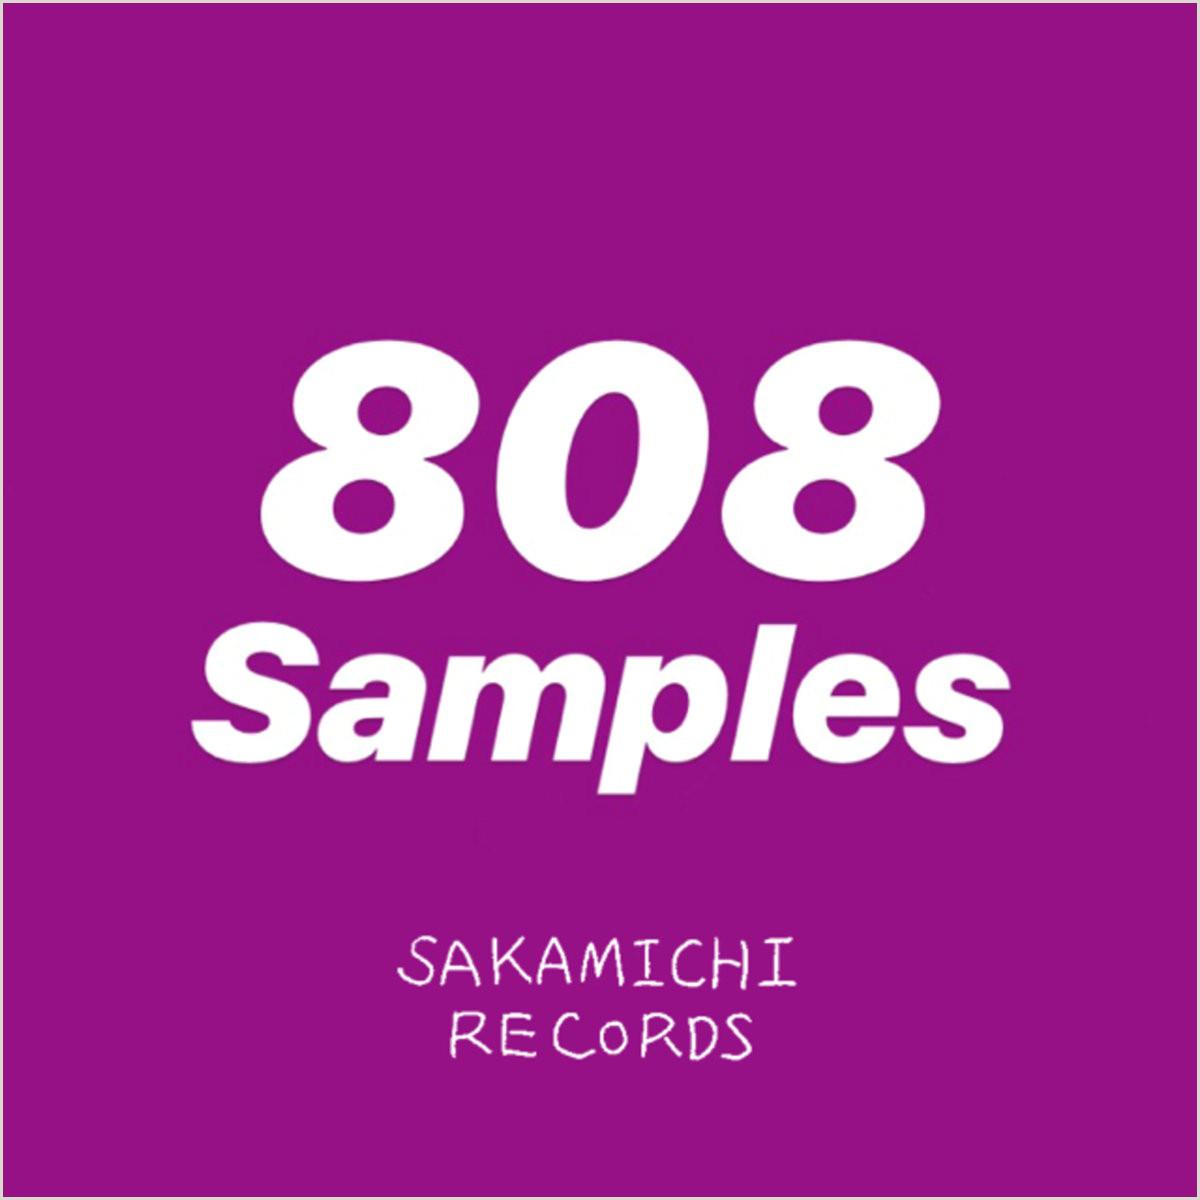 Free Pull Up Samples Usa 808 Samples Royalty Free Samples